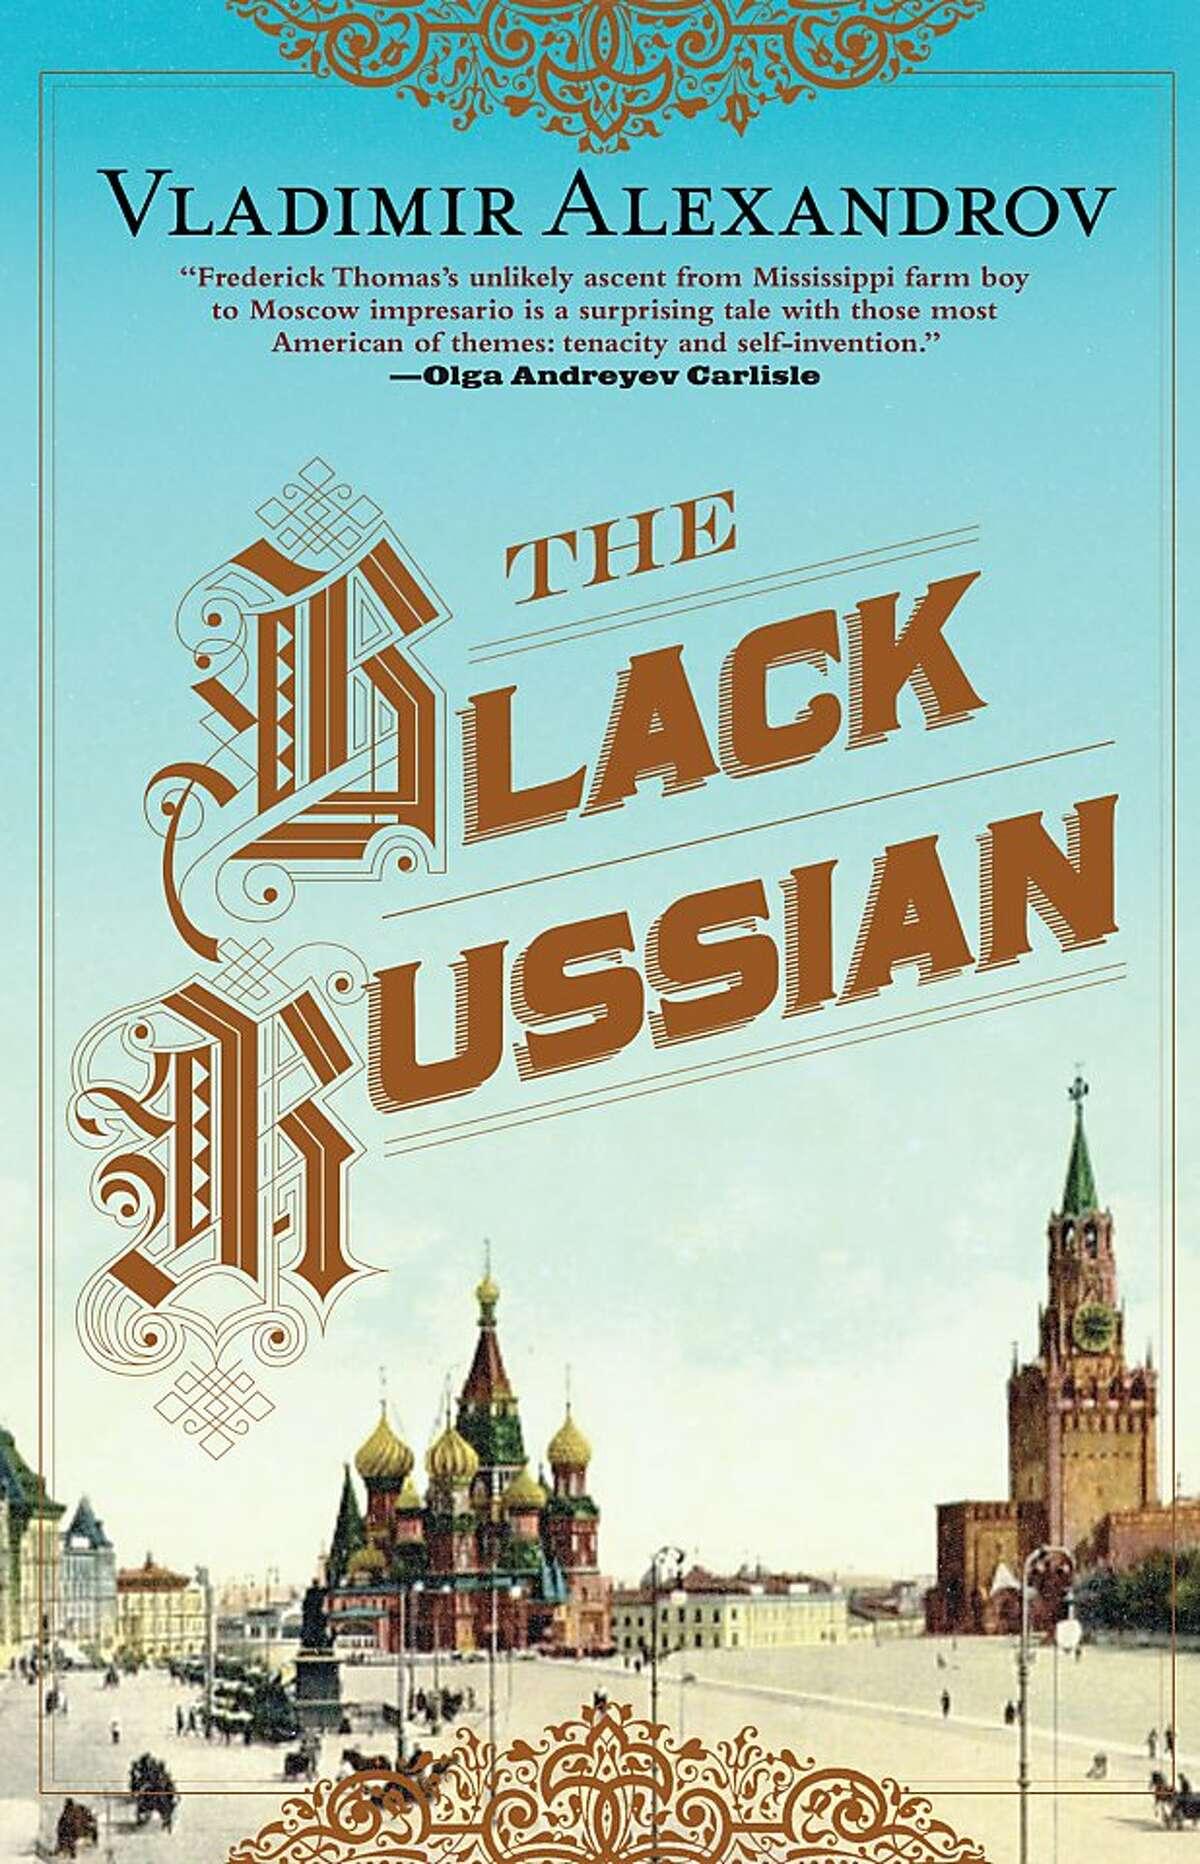 The Black Russian, by Vladimir Alexandrov